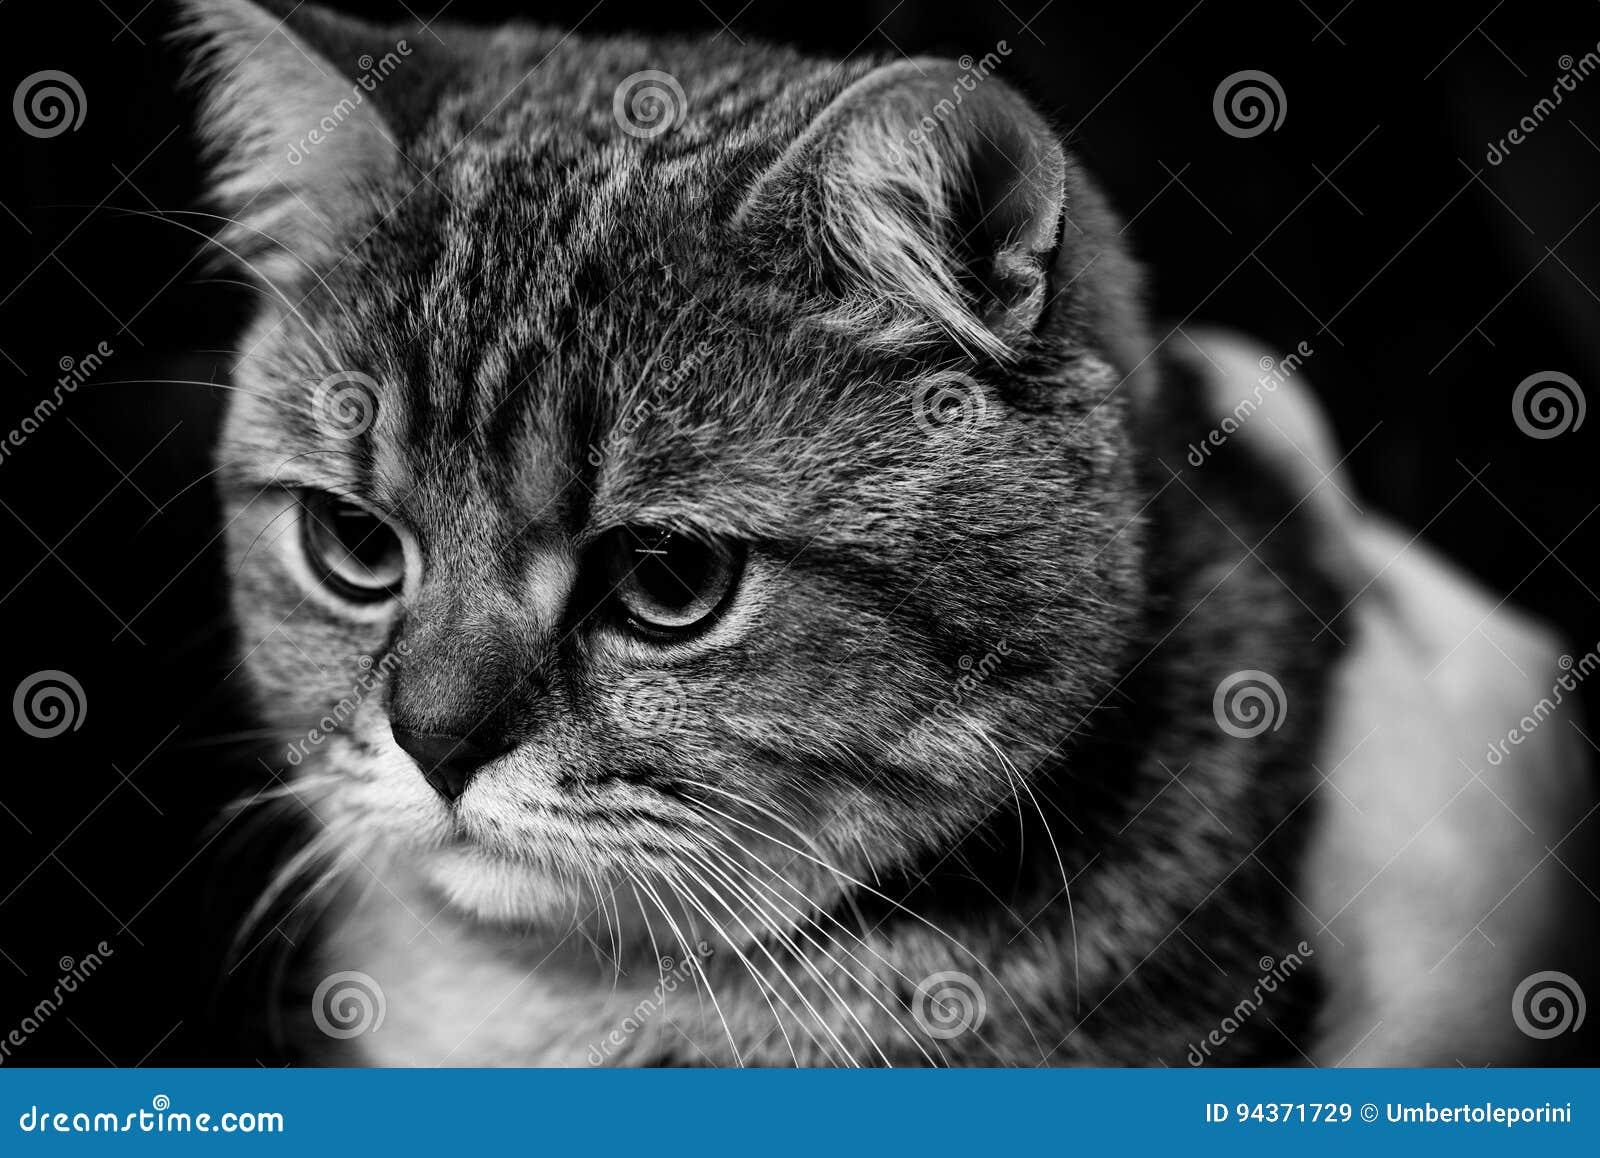 Cute scottish cat black and white animals portraits